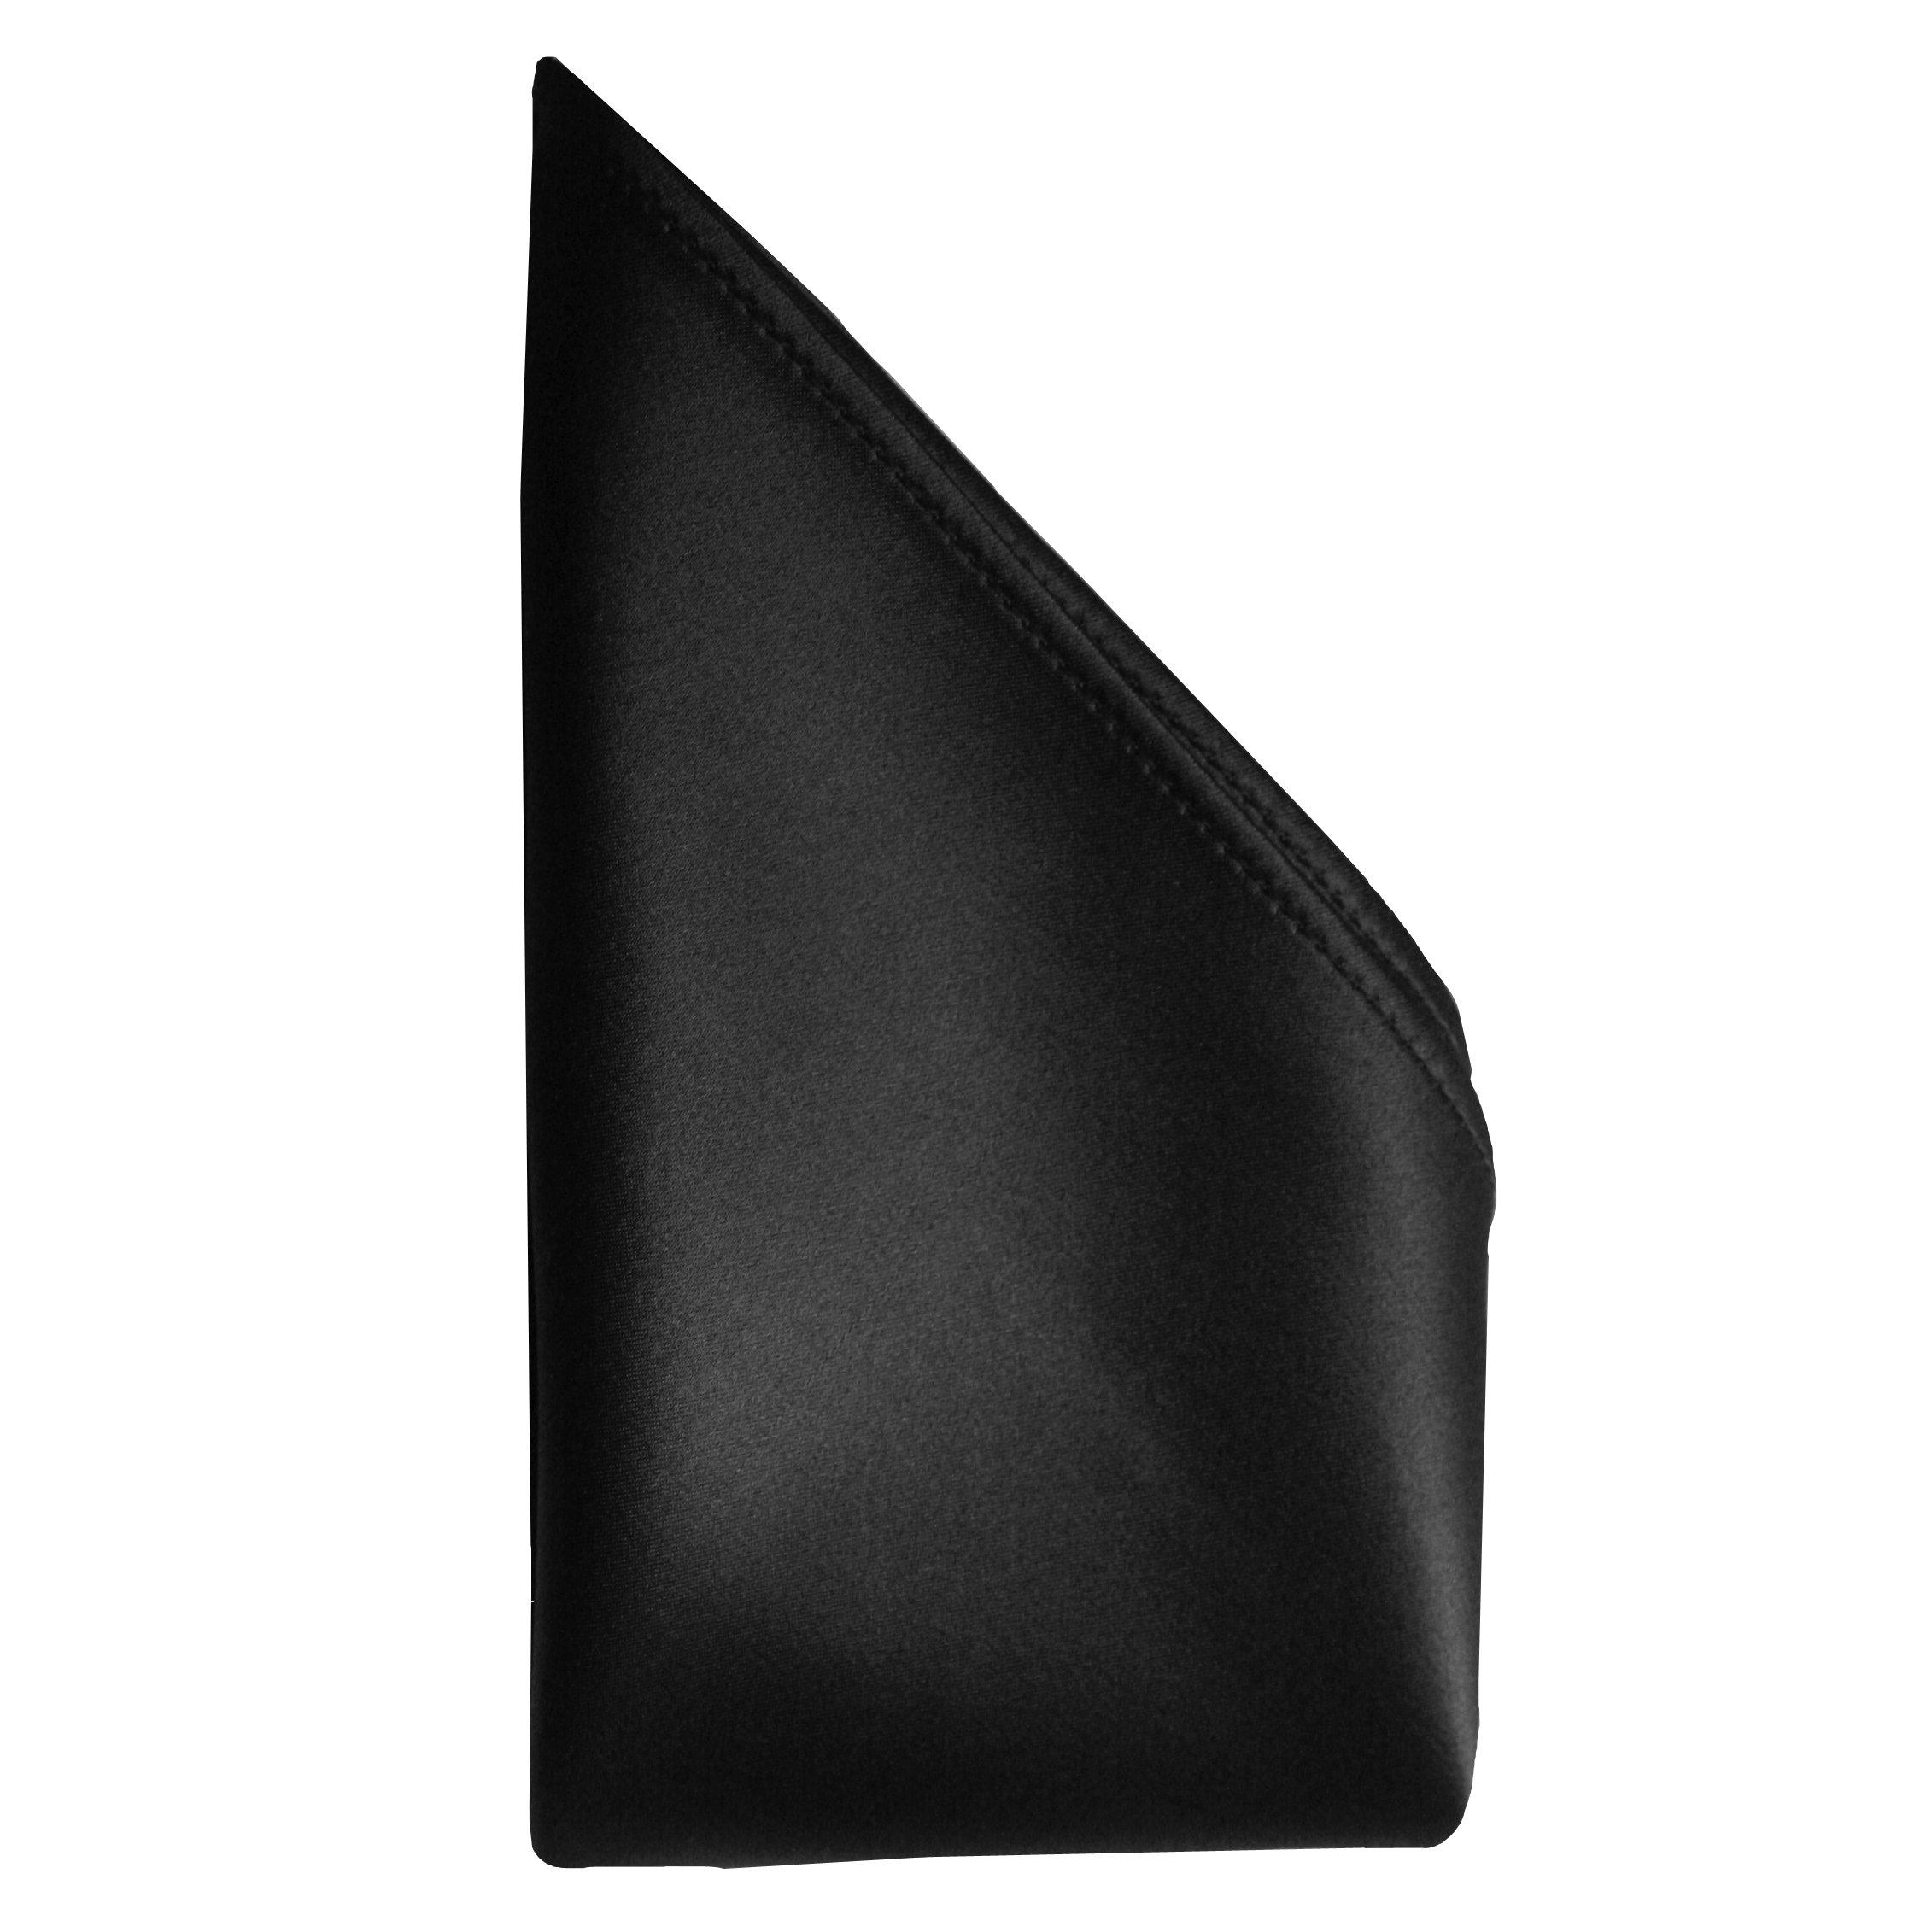 Creamy Satin Silk Handkerchief by Royal Silk - Black - Full-Sized 16''x16''